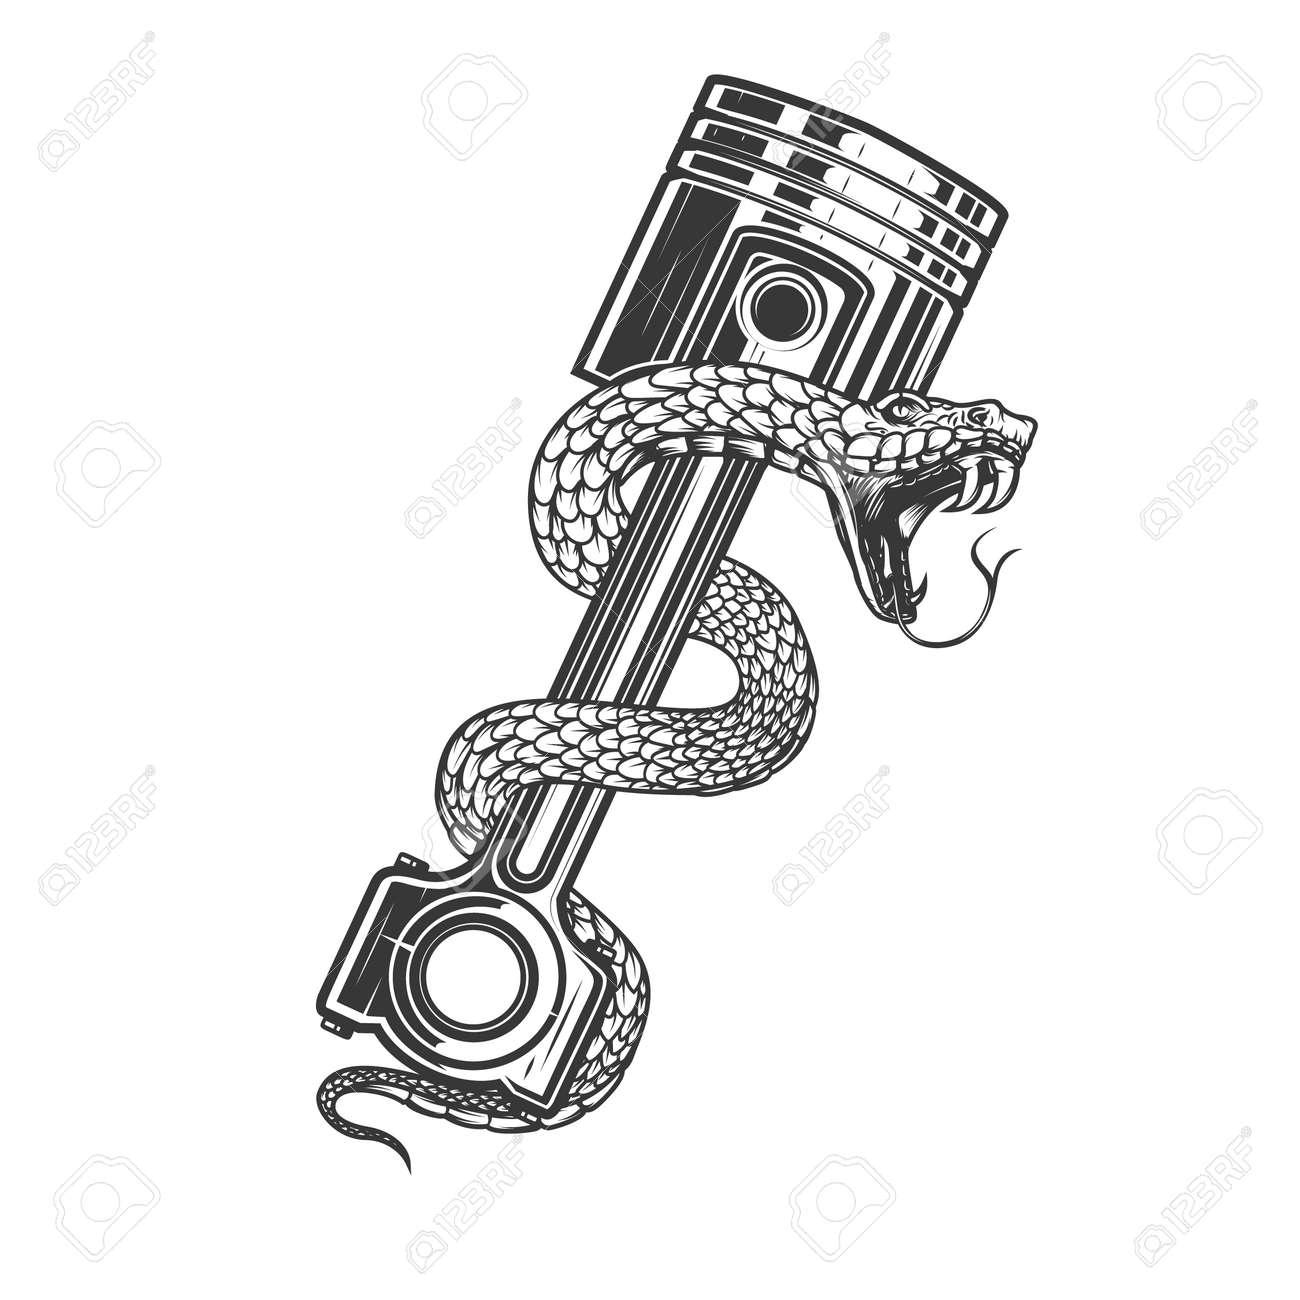 Illustration of snake on car piston. Design element for poster, card, banner, sign. Vector illustration - 170095961